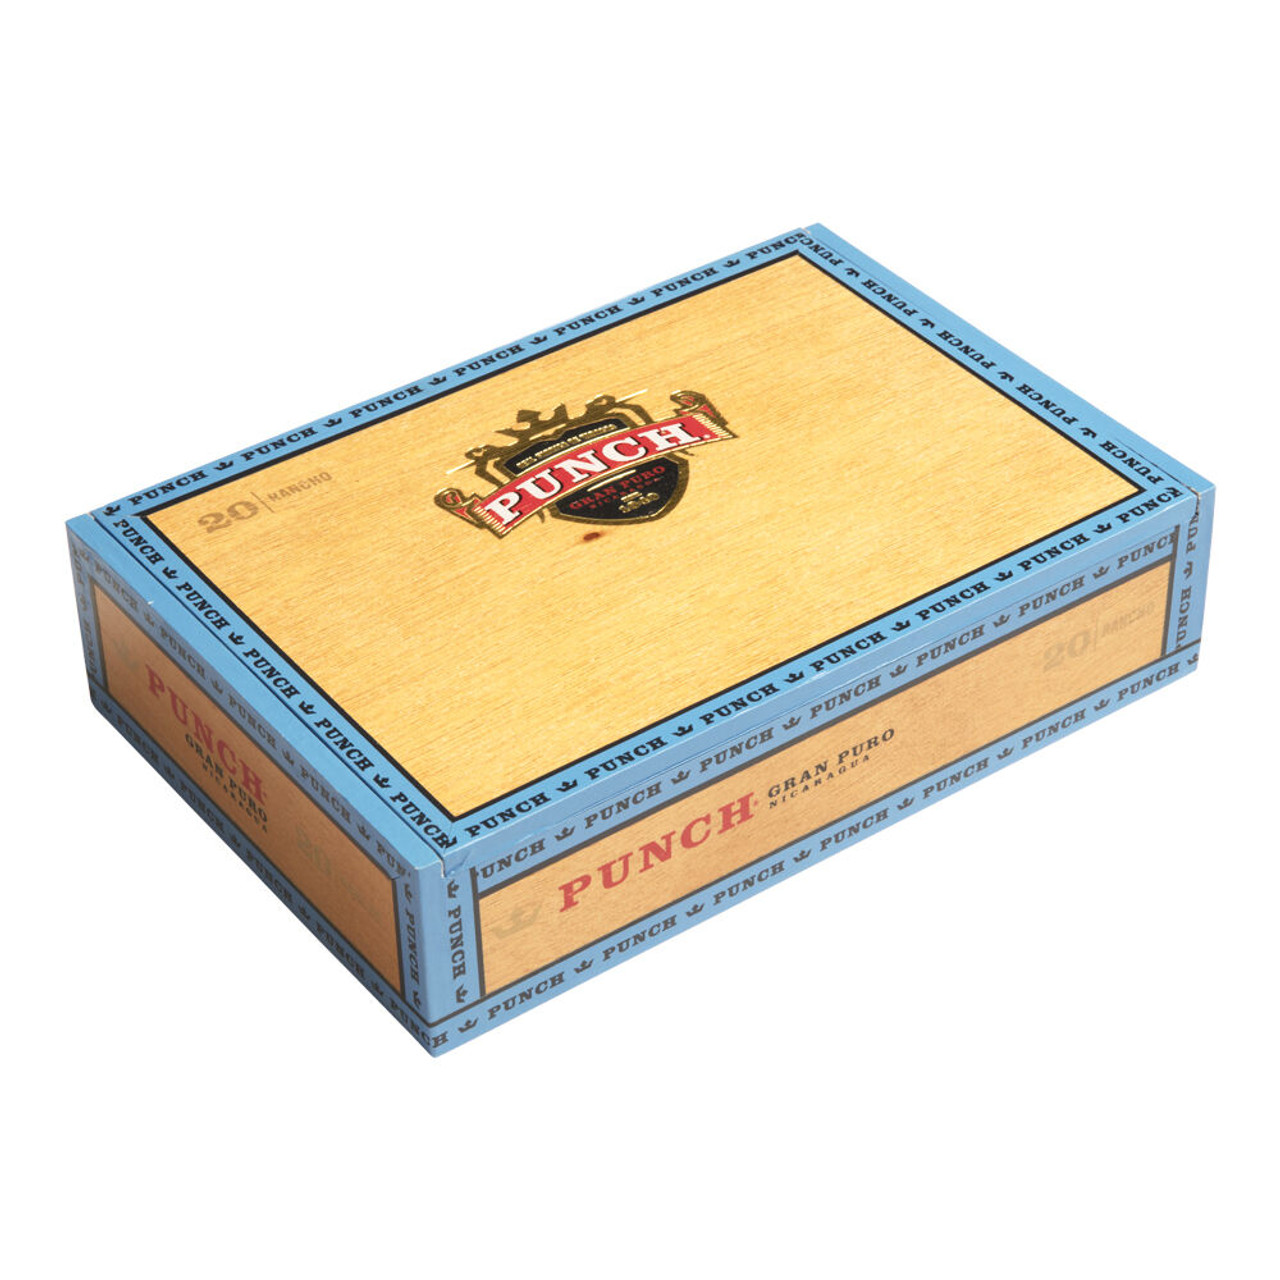 Punch Gran Puro Nicaragua Cigars - 4.88 x 48 (Box of 20)